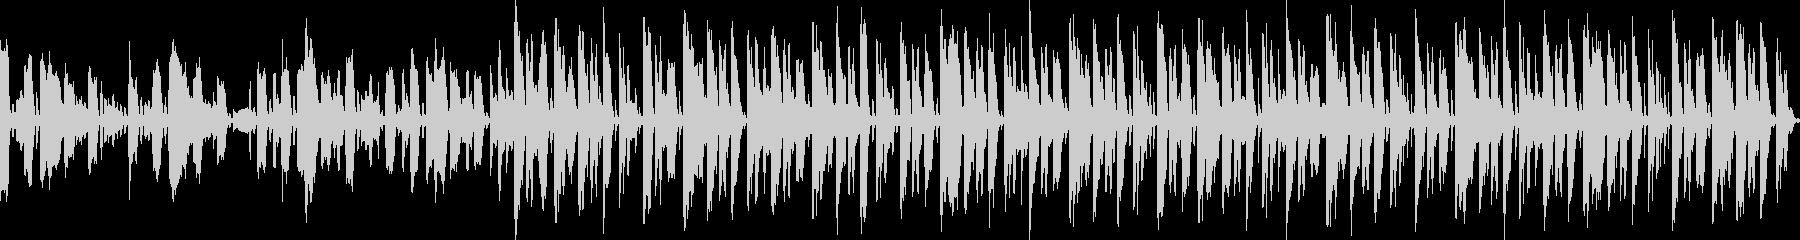 (loop)朗らかエレポップの未再生の波形